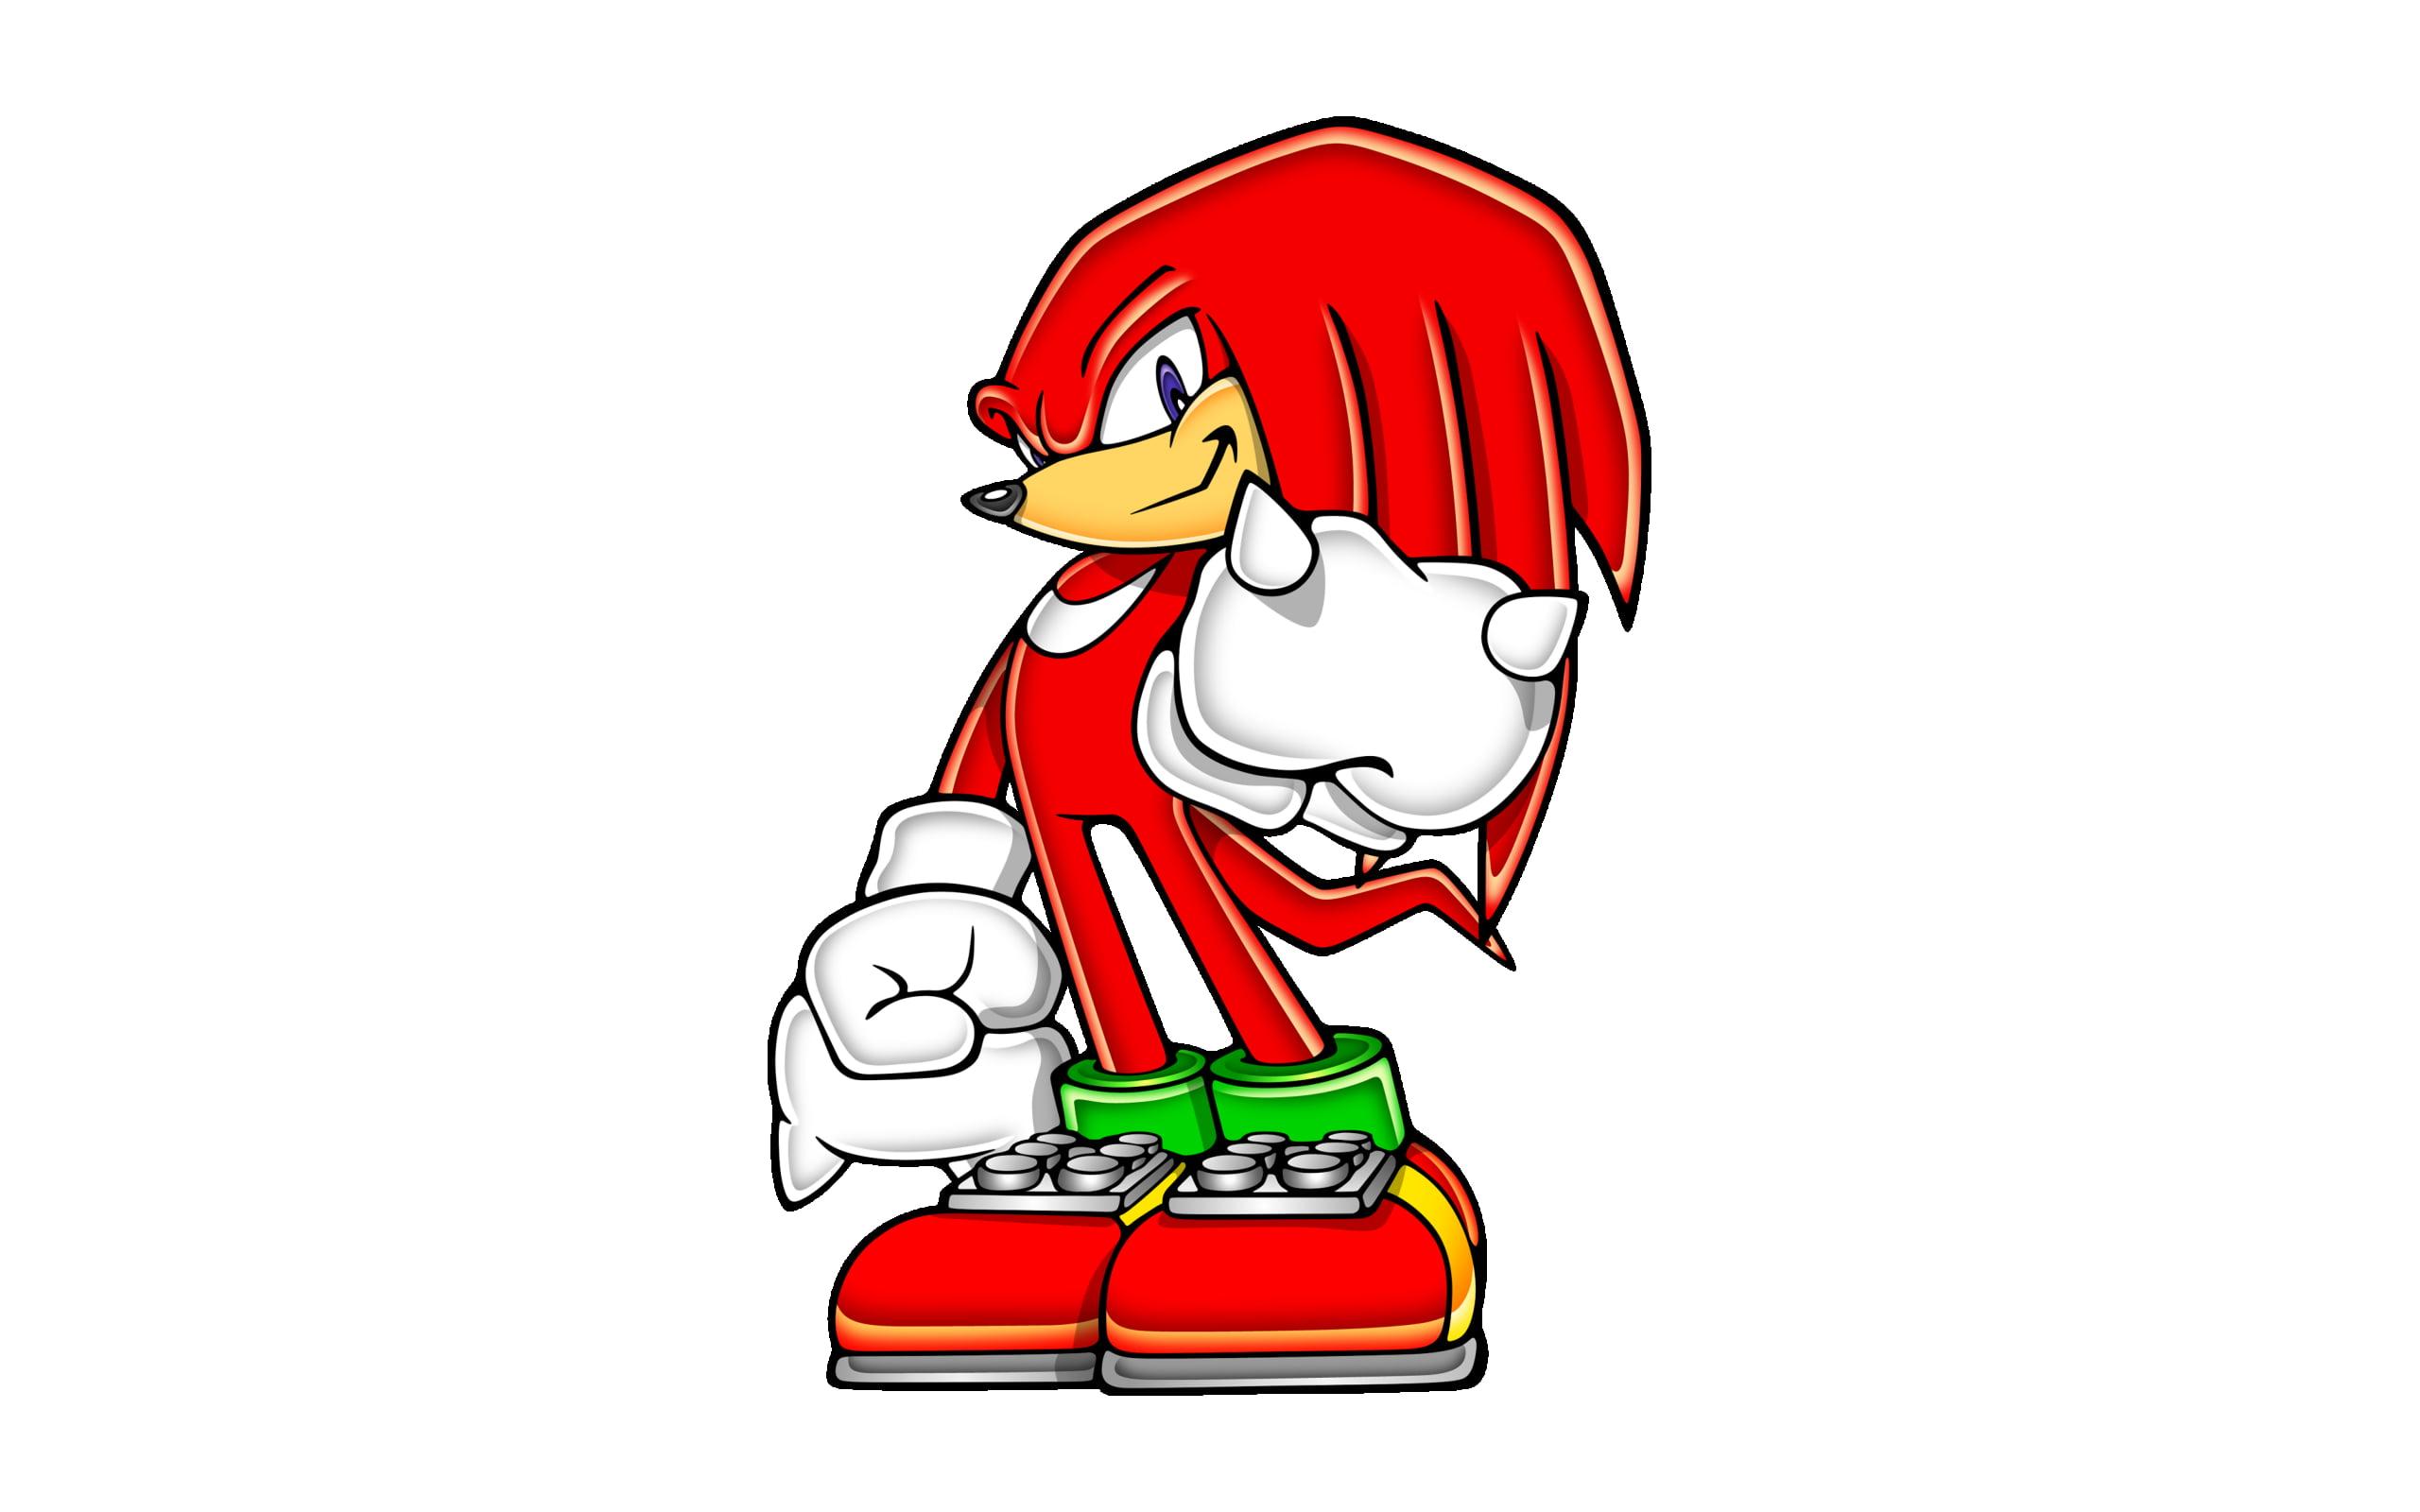 Sonic The Hedgehog Character Illustration Knuckles Sonic The Hedgehog Sonic Transparent Background Hd Wallpaper Wallpaper Flare